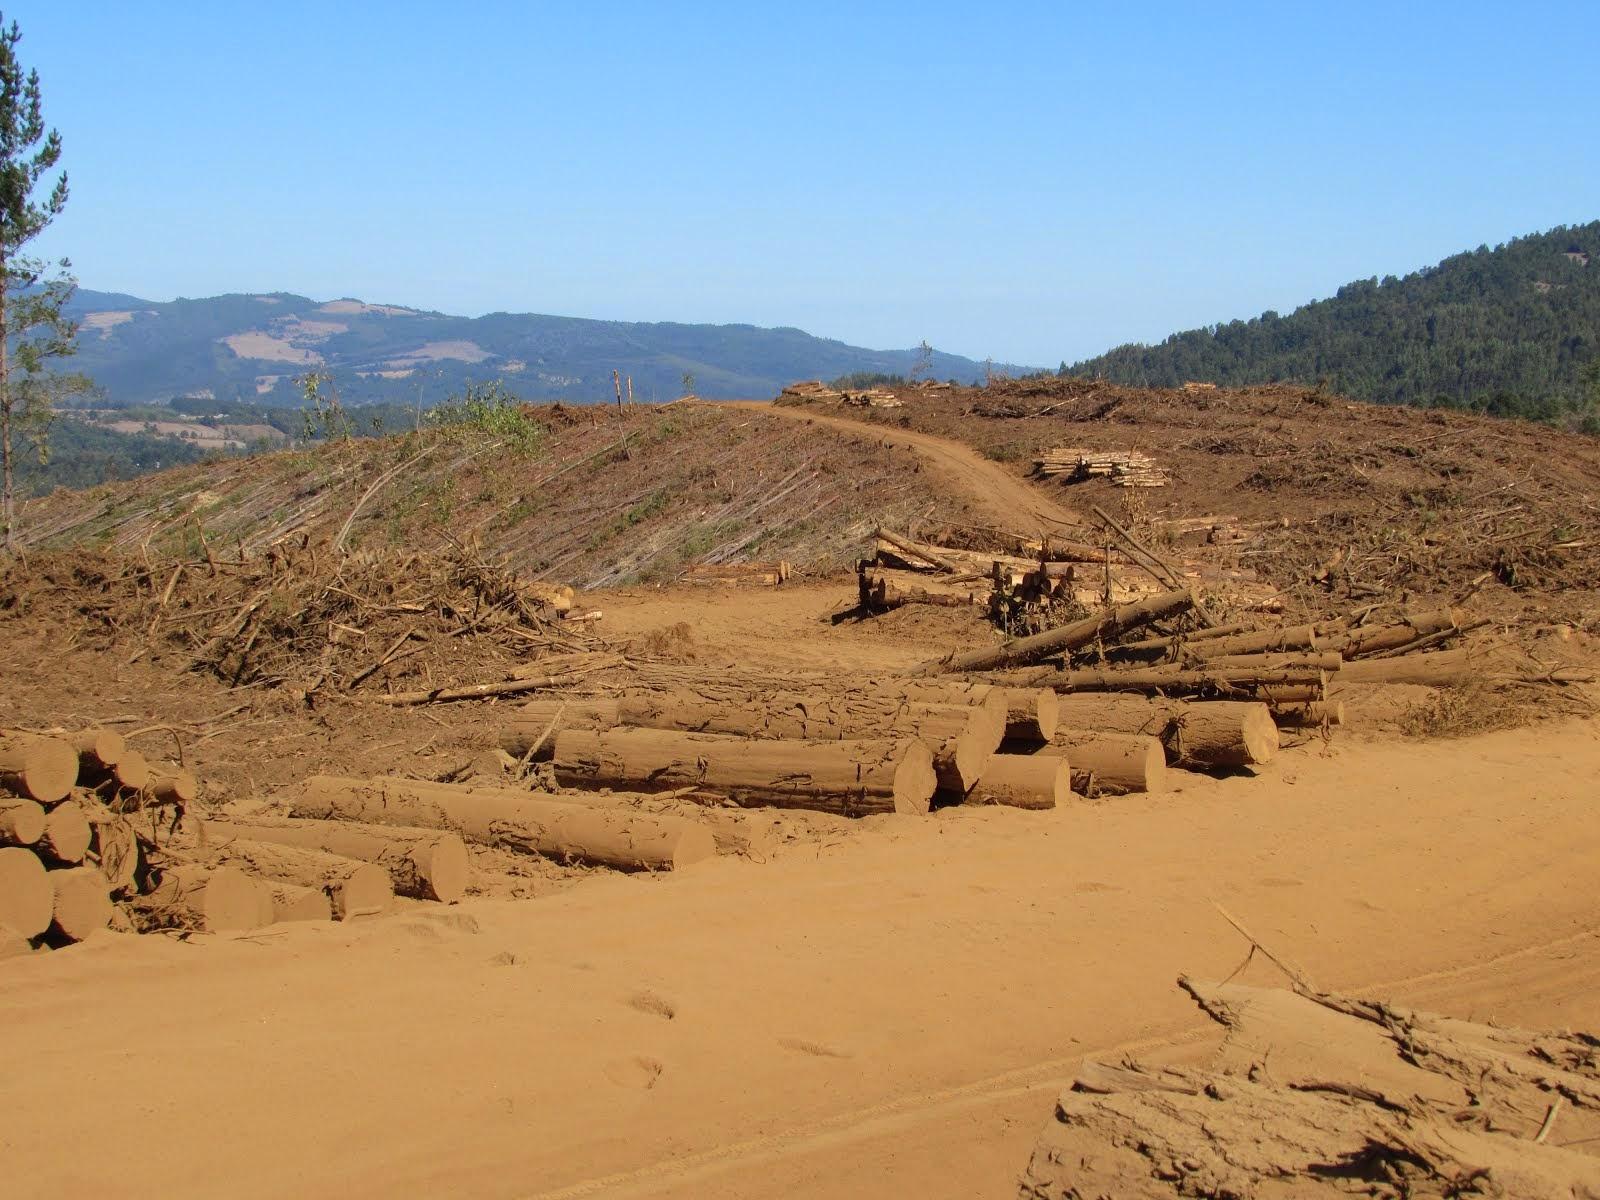 Fundo de la Forestal Arauco-Valdivia, Territorio Ancestral de la Comunidad Mapuche de Lumaco